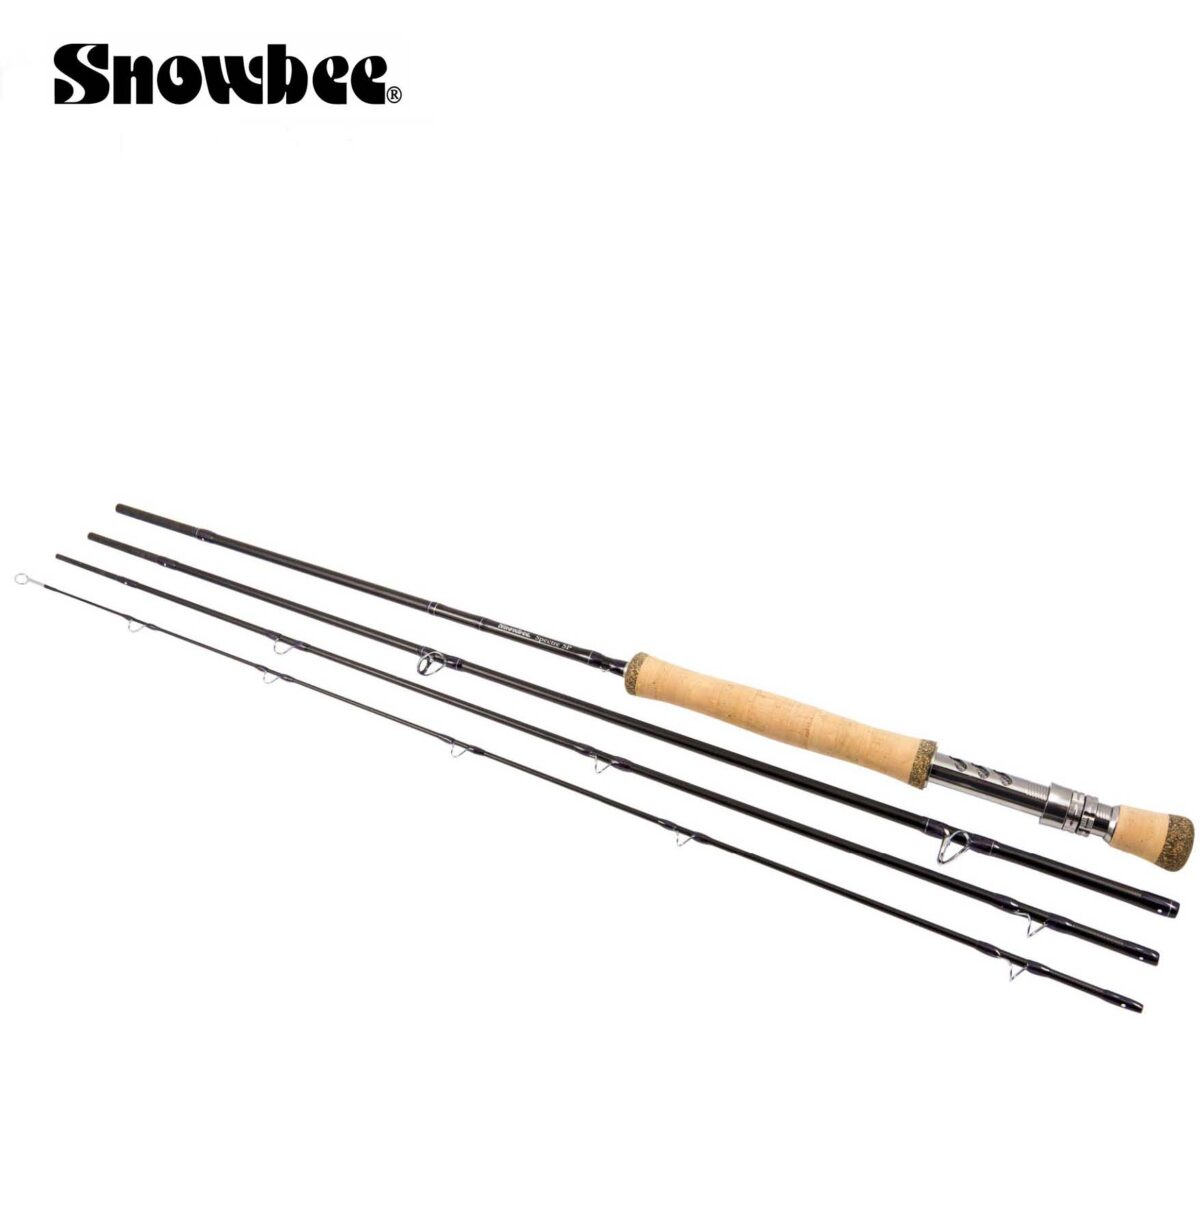 Caña de Mosca Snowbee Spectre Saltwater 9 Pies Linea 8